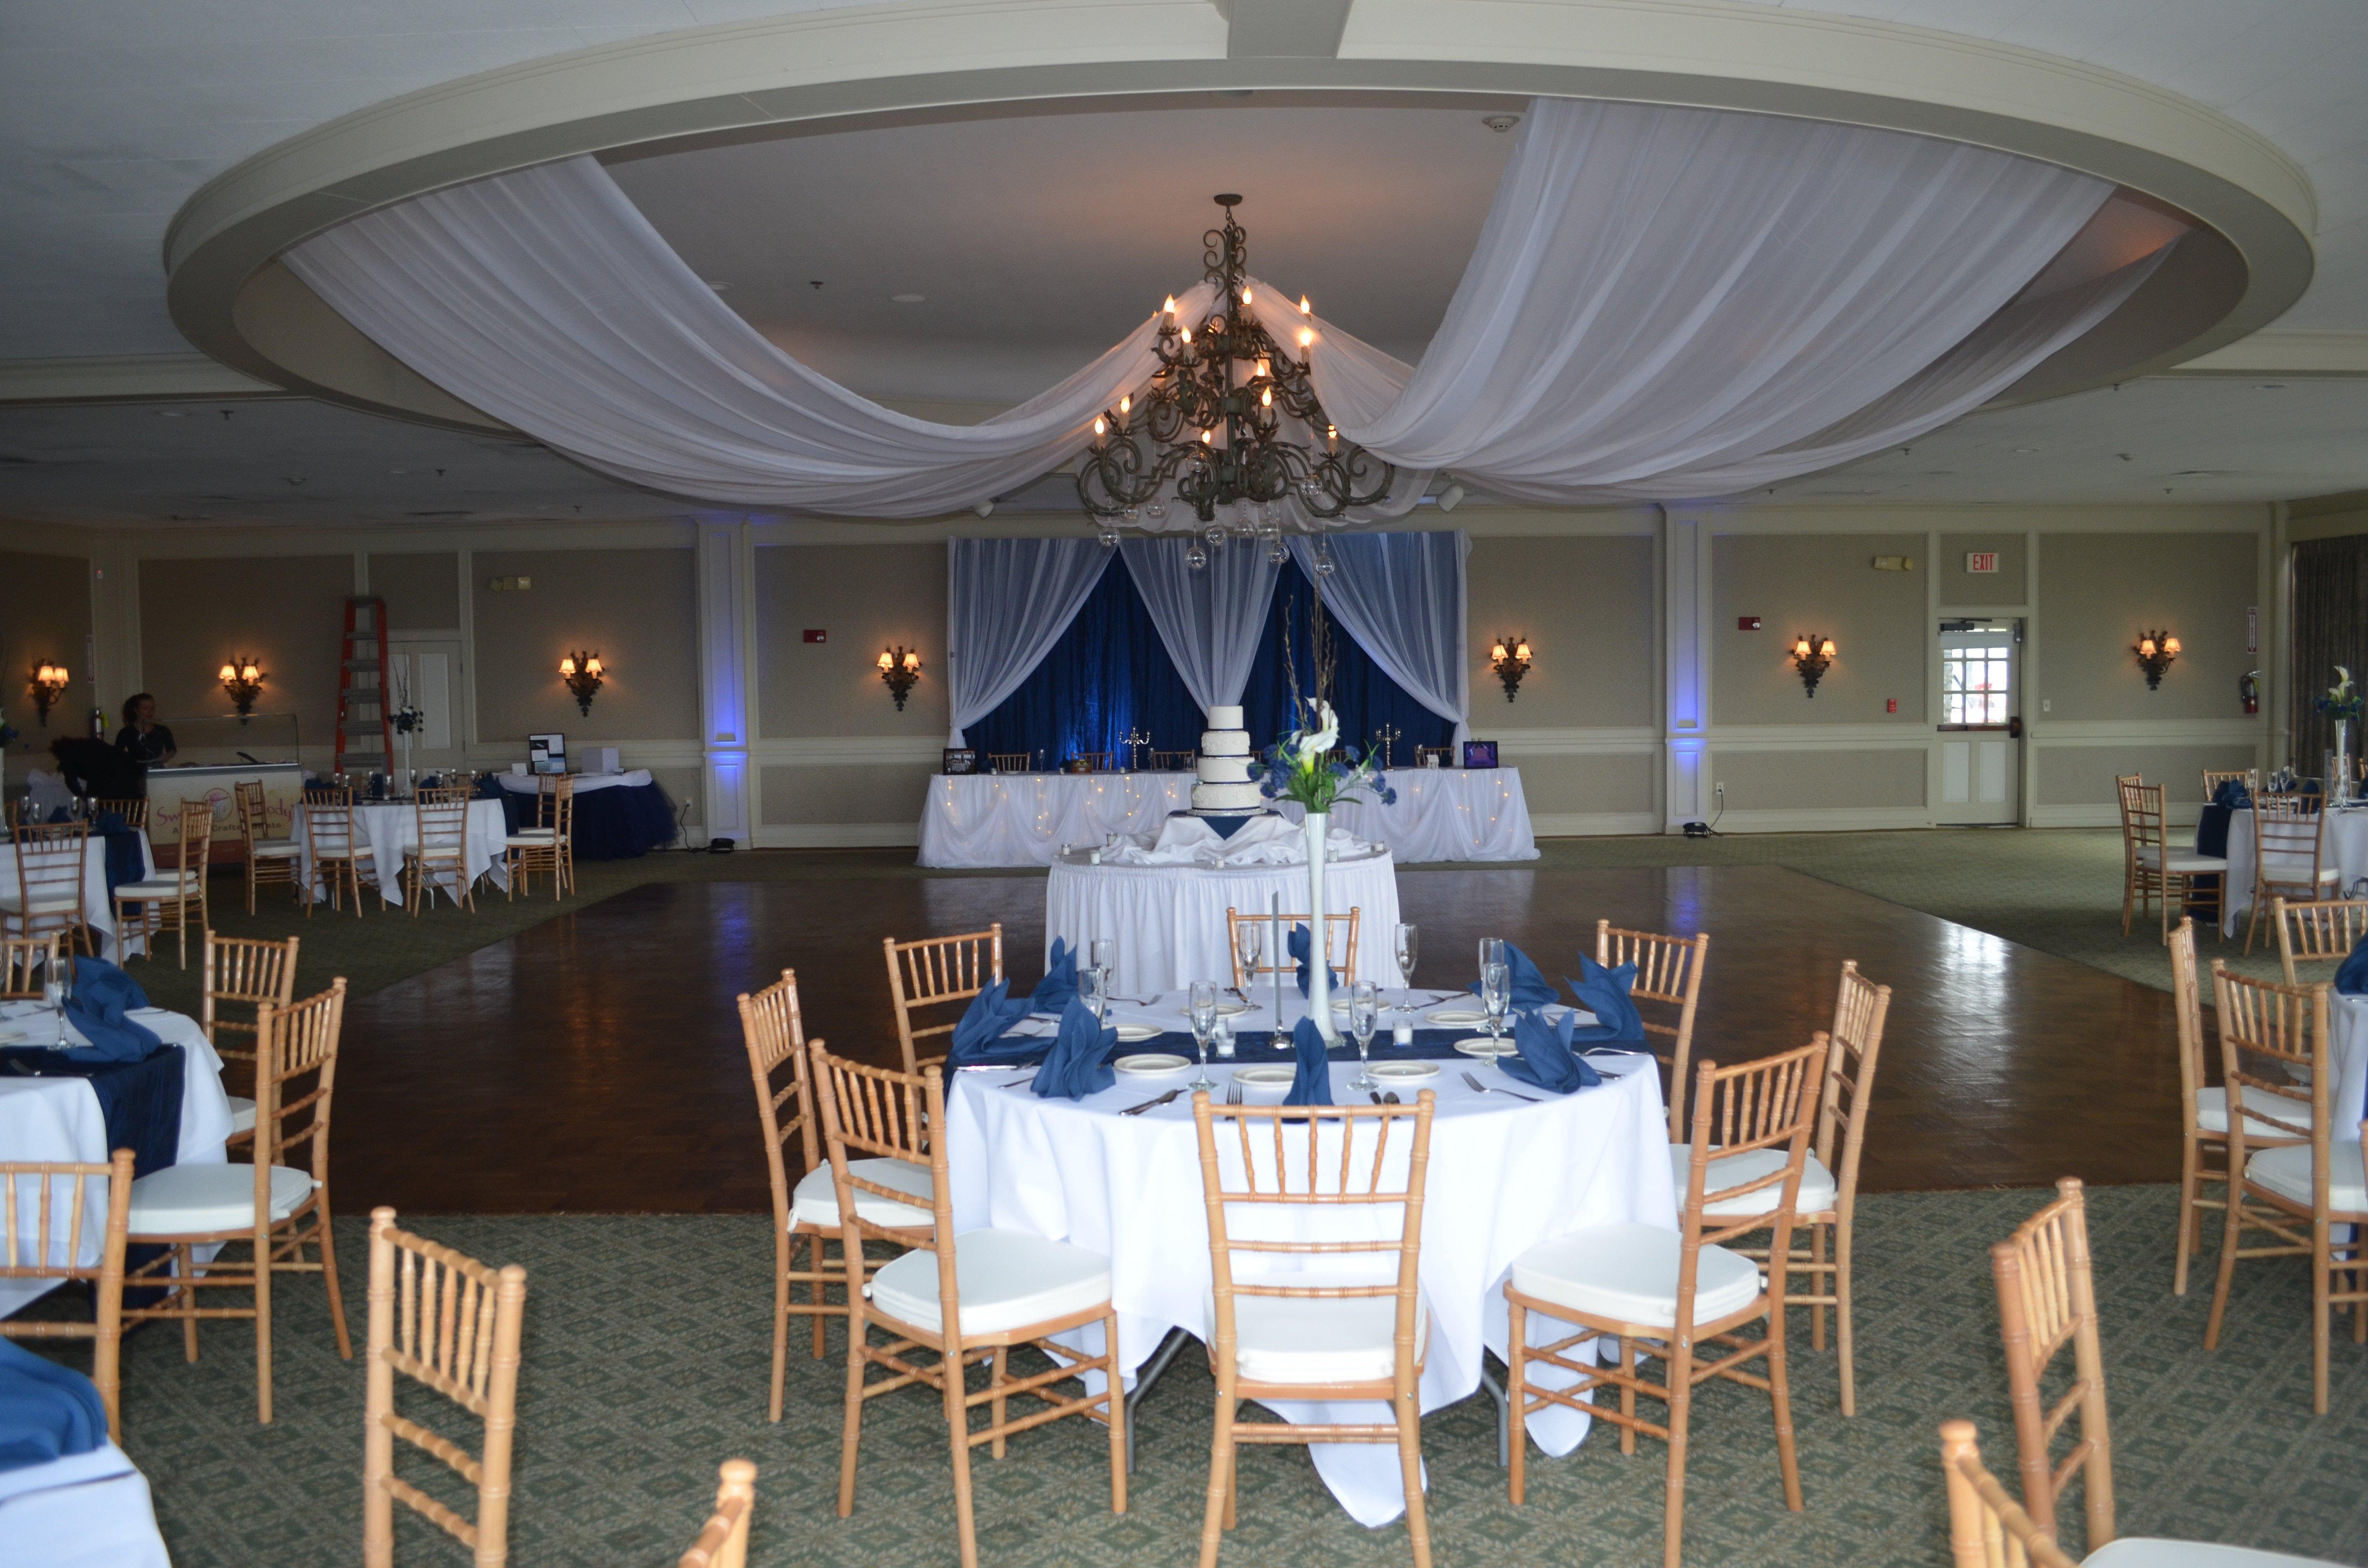 Navy Blue and White Decor Inspirational Navy Blue & White Buffalo Wedding Decor Ideas